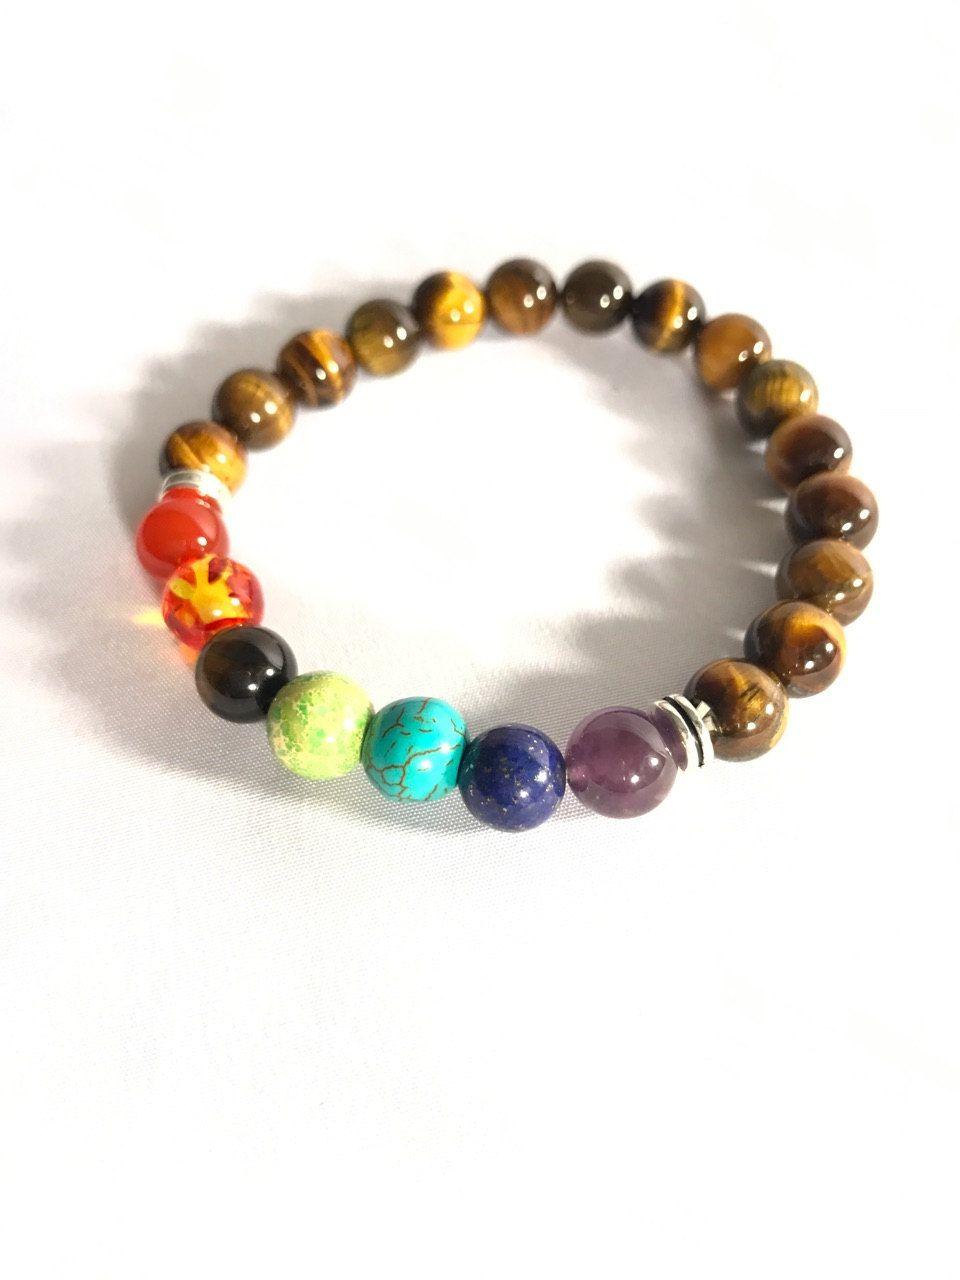 Tiger Eye Bracelet, Tiger Eye, 6mm Healing Crystal Bracelet, 7 Chakra Bracelets, by HolisticViewByAshley on Etsy